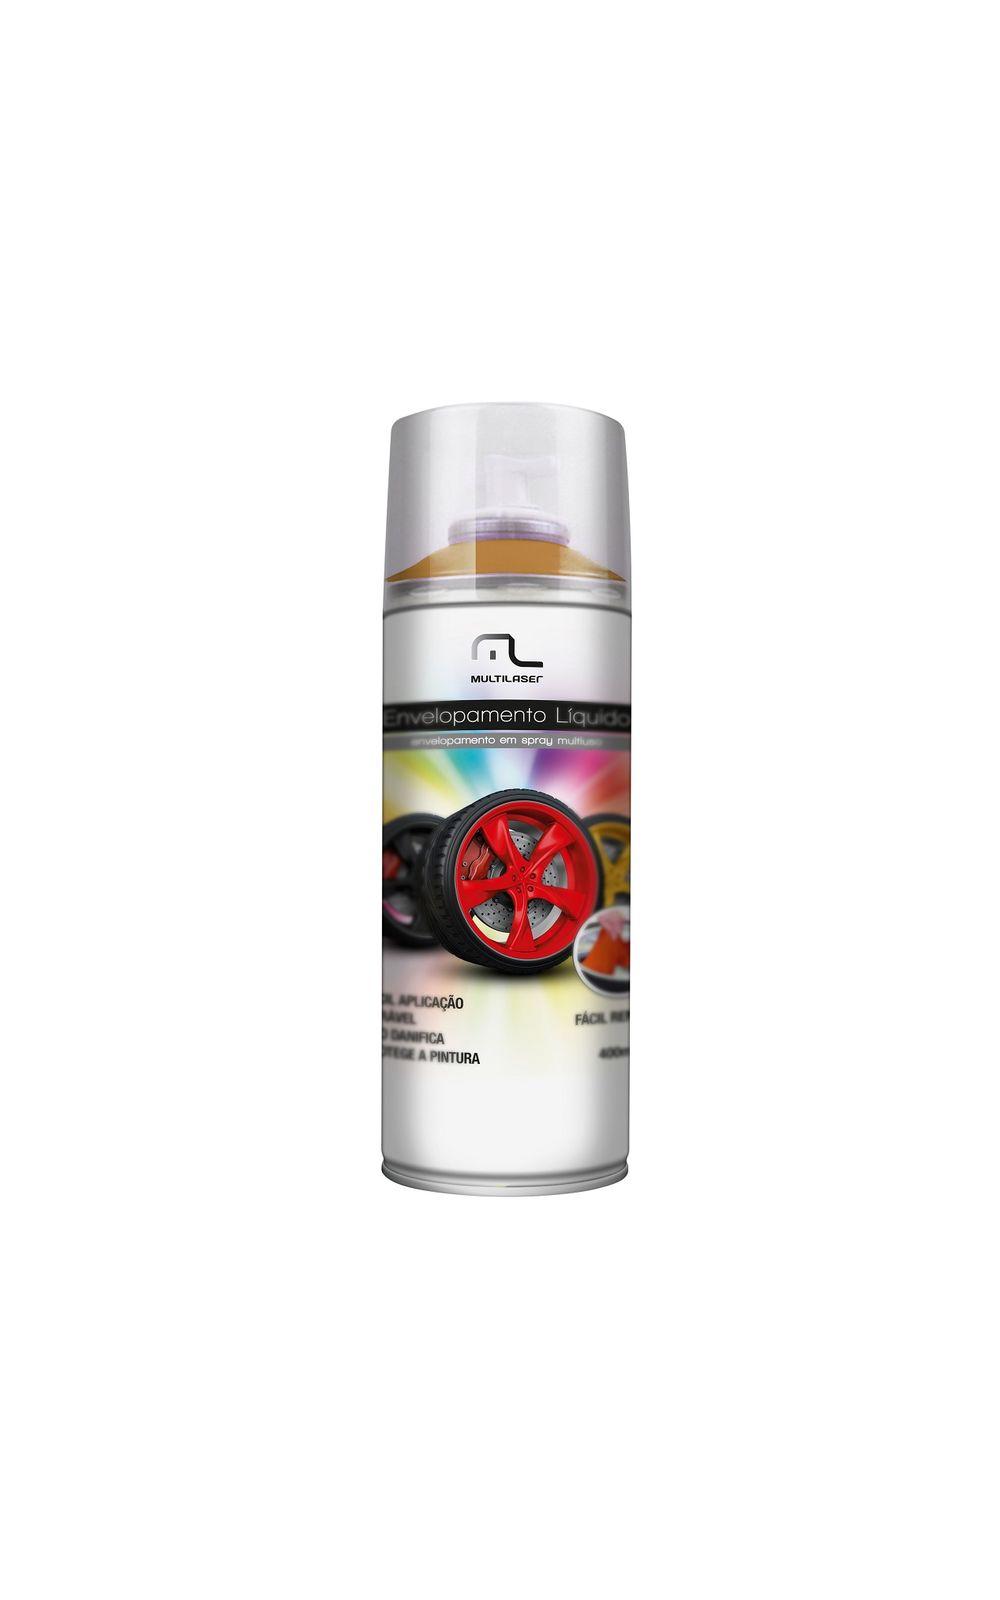 Foto 1 - Spray de Envelopamento Multilaser Liquido Dourado 400ml - AU422